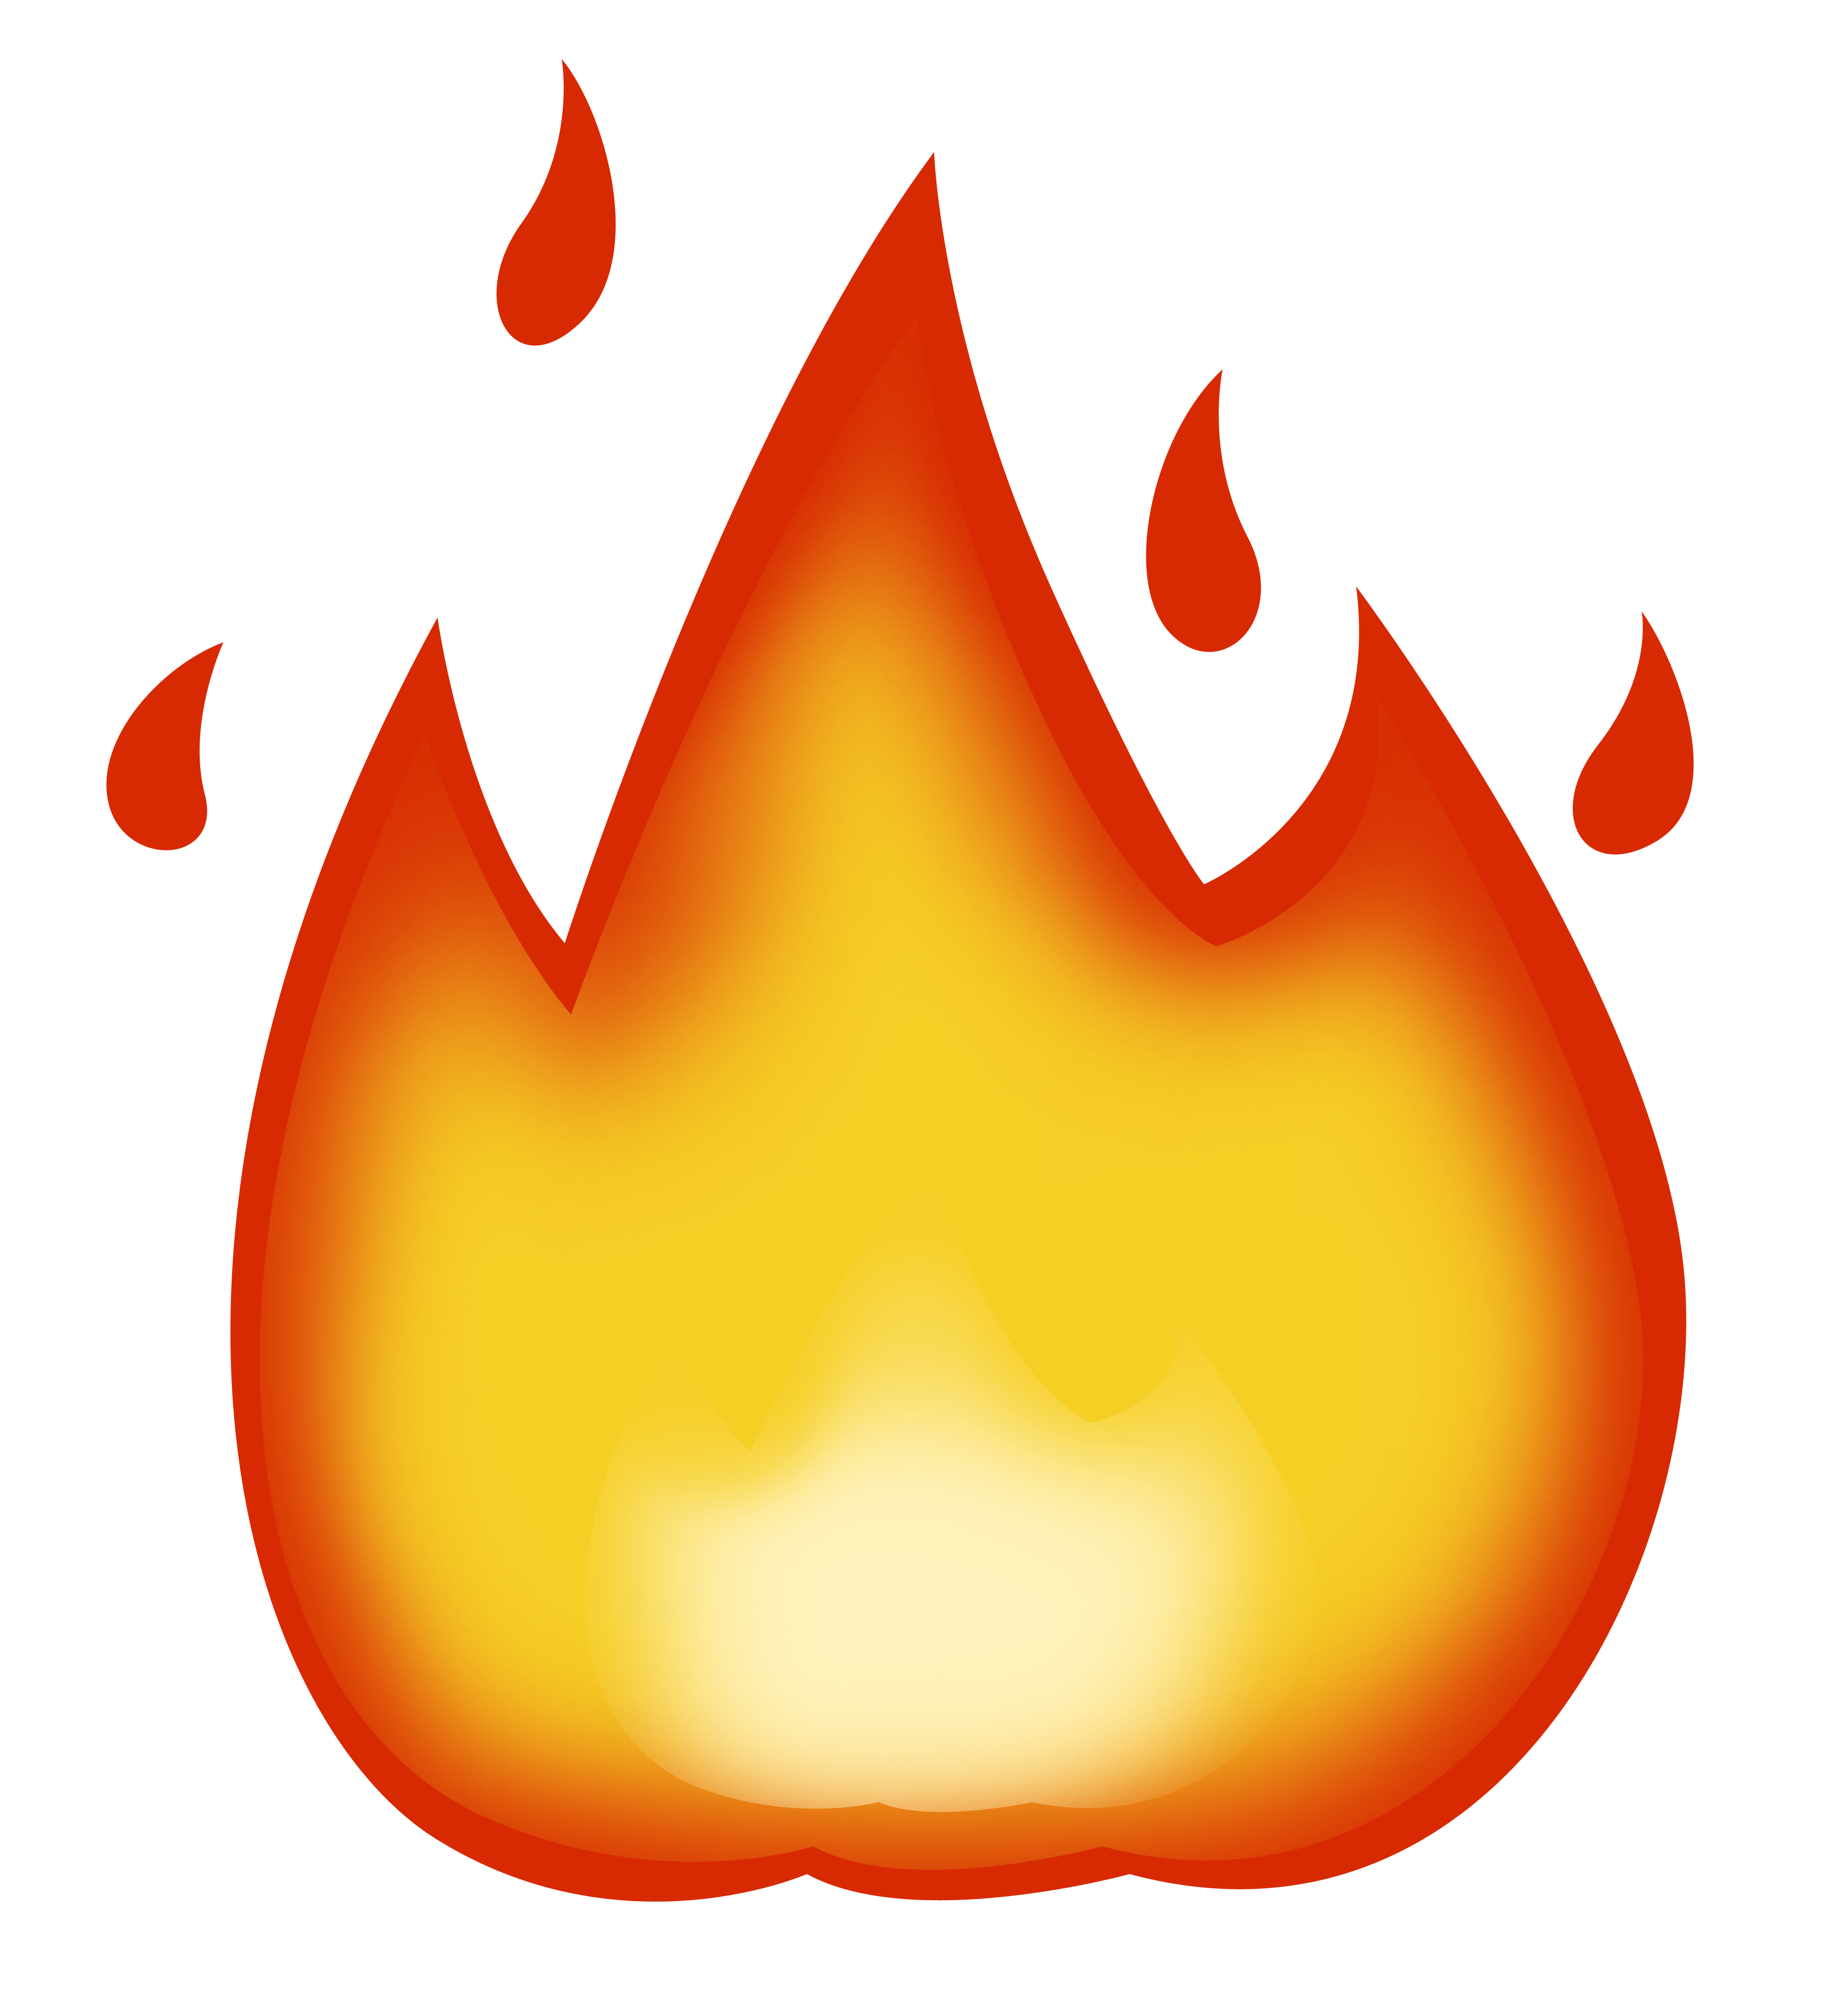 Flame Emoji Cutouts - Oversized Cutouts - Build A-Head